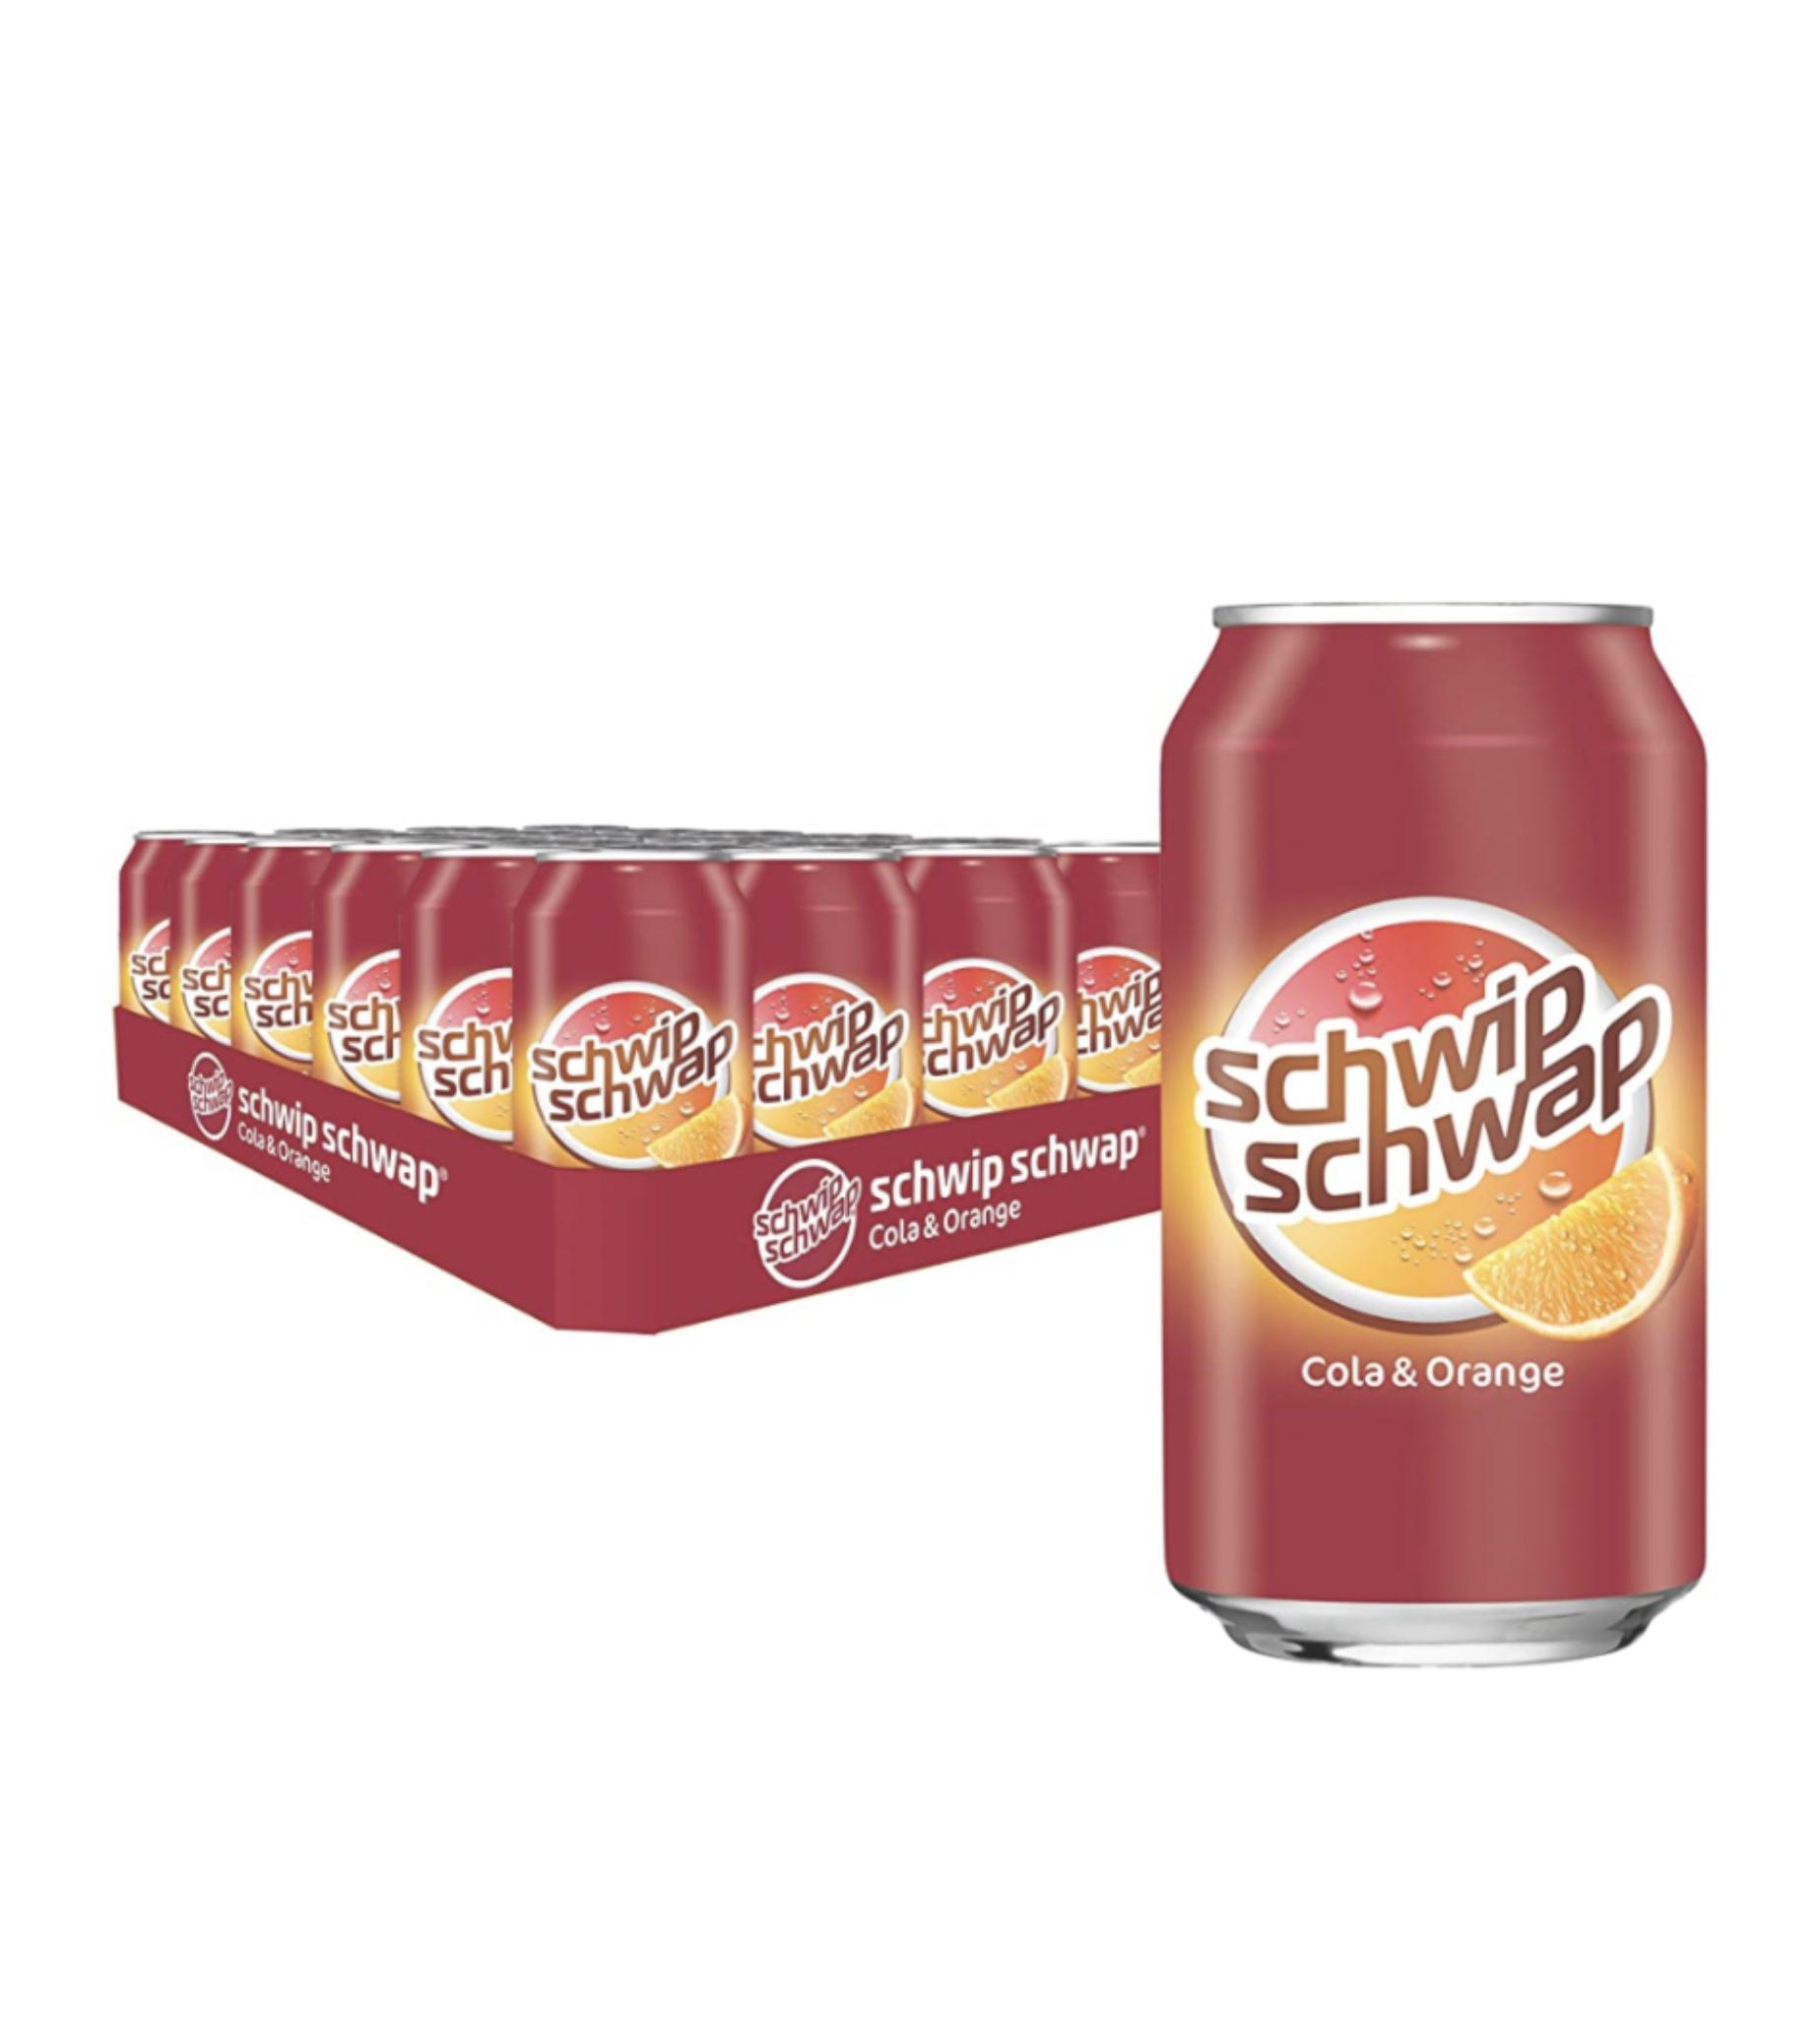 [Prime] Schwip Schwap 24er Pack (24 x 0,33l) ab 8,54 € inkl Versand zzgl. 6 € Pfand